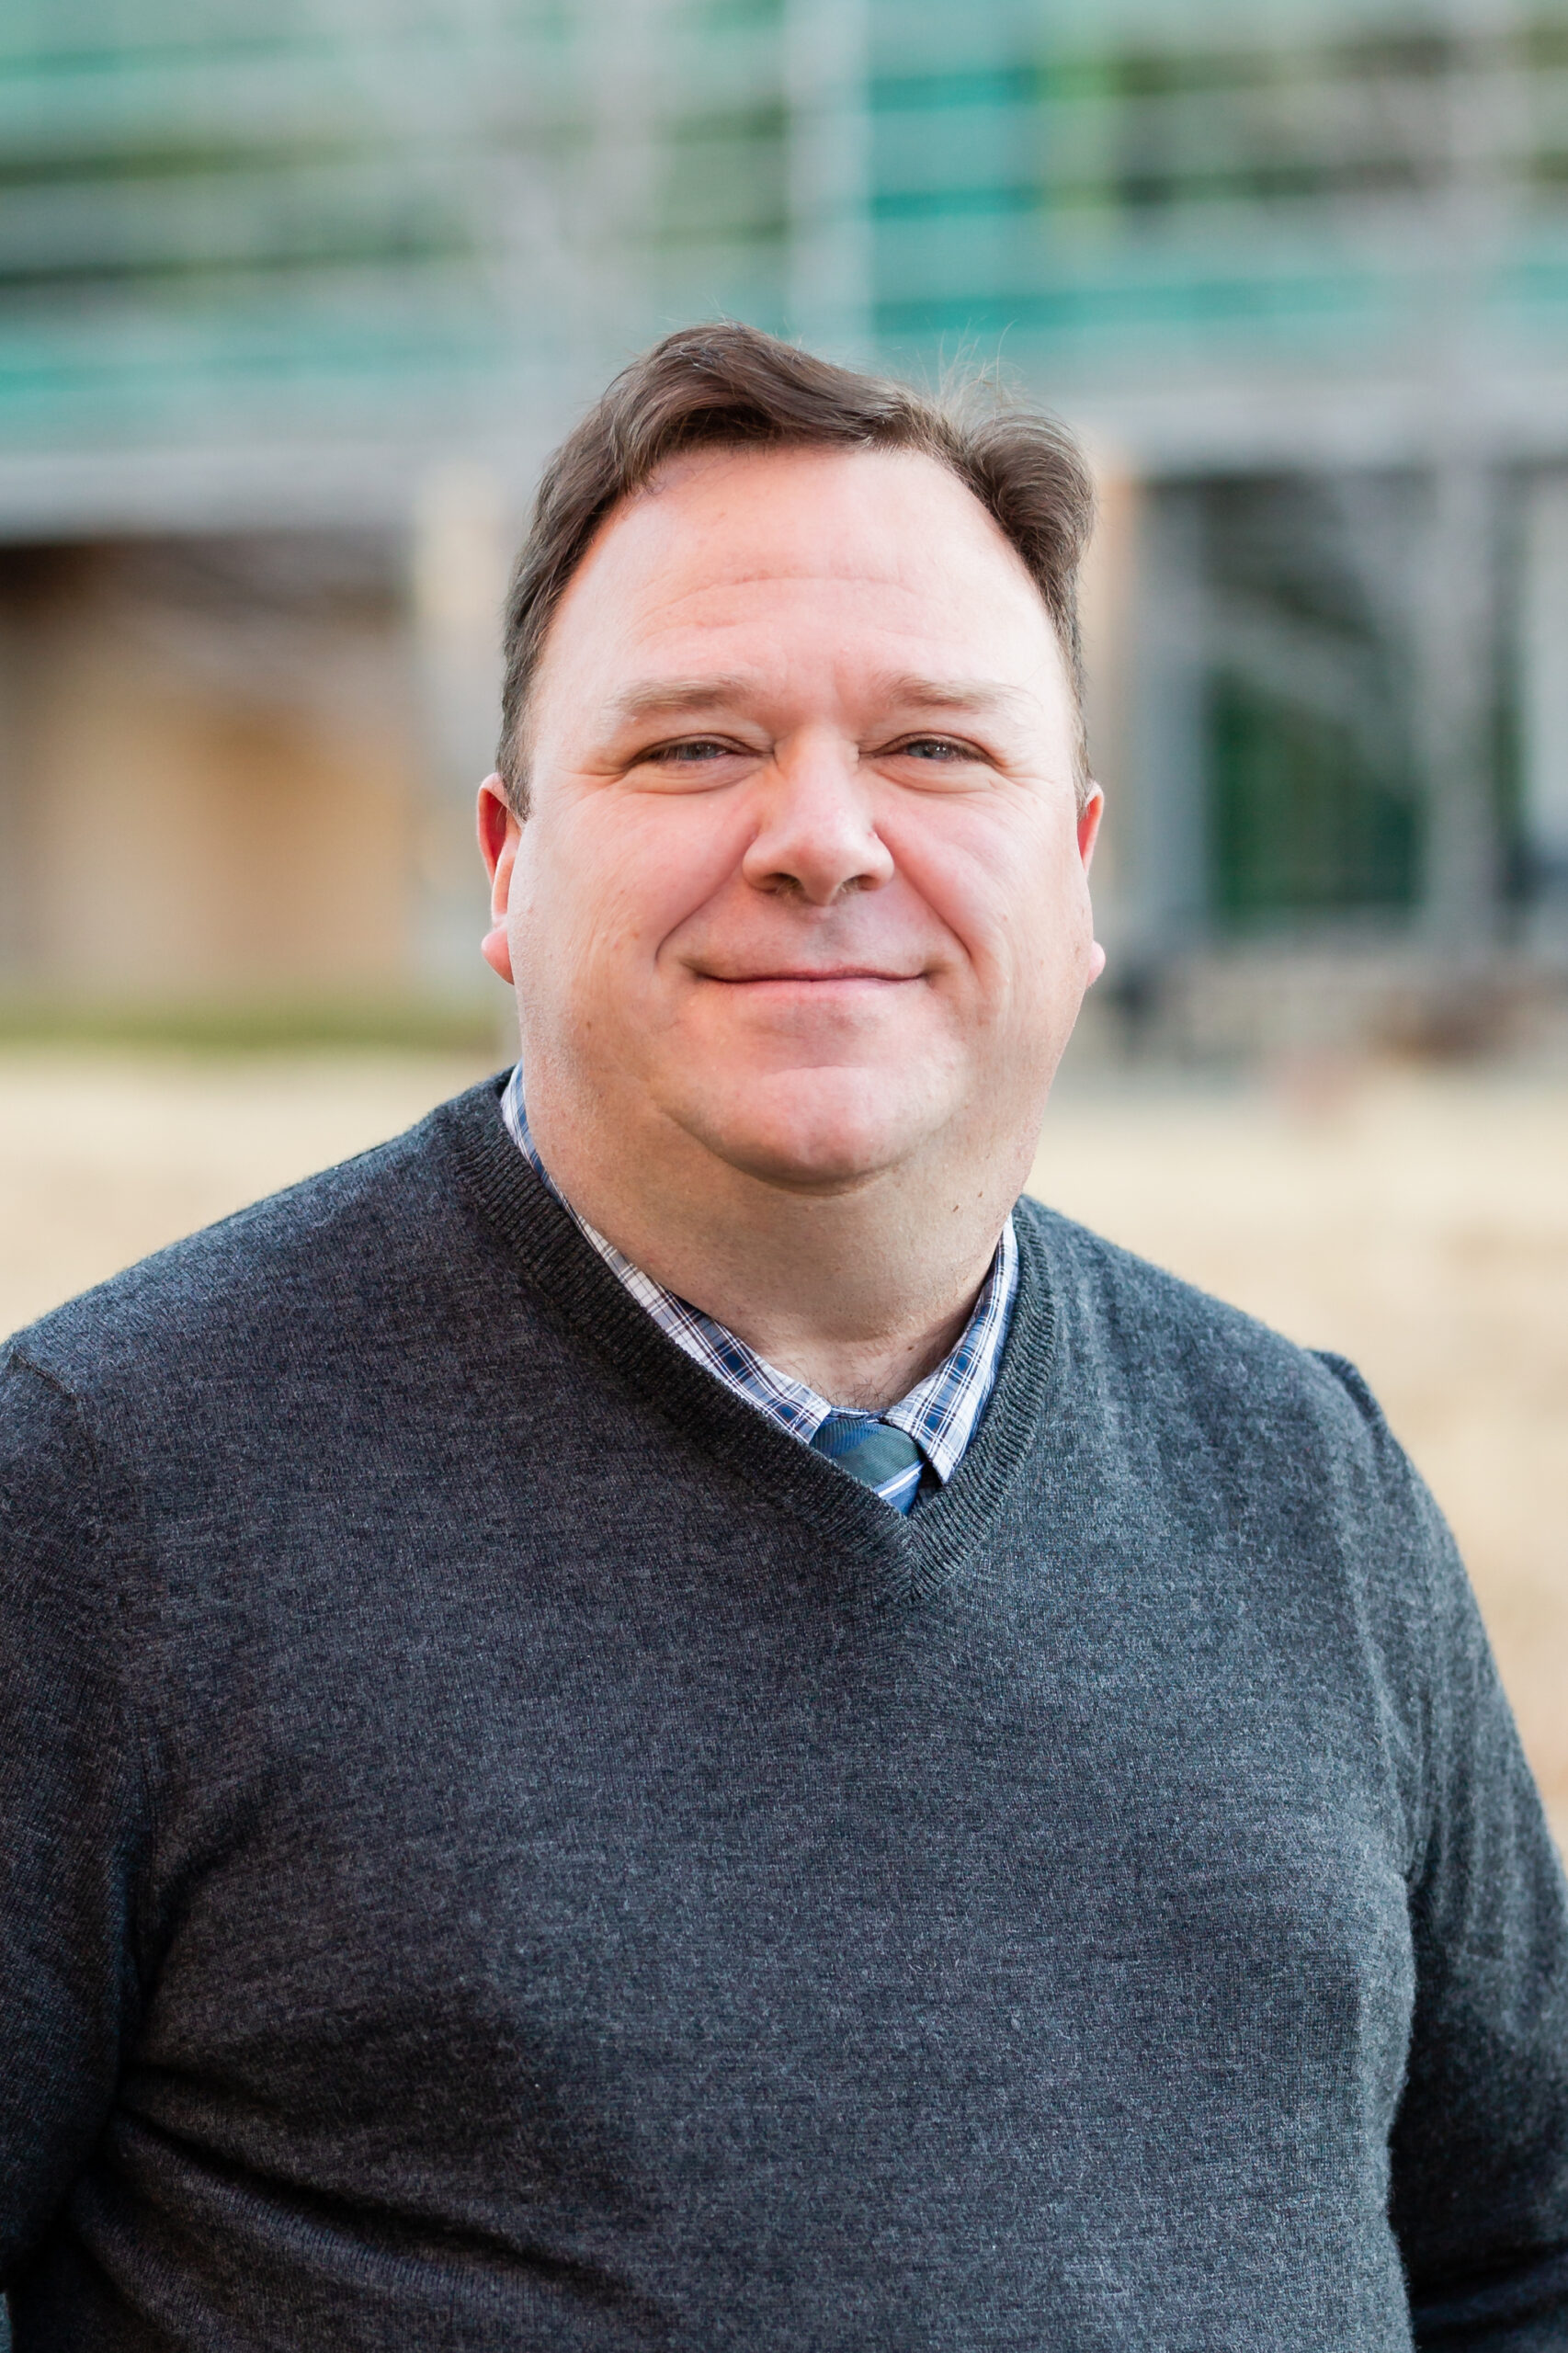 Dr. Stephen Scott, University of Colorado OB-GYN